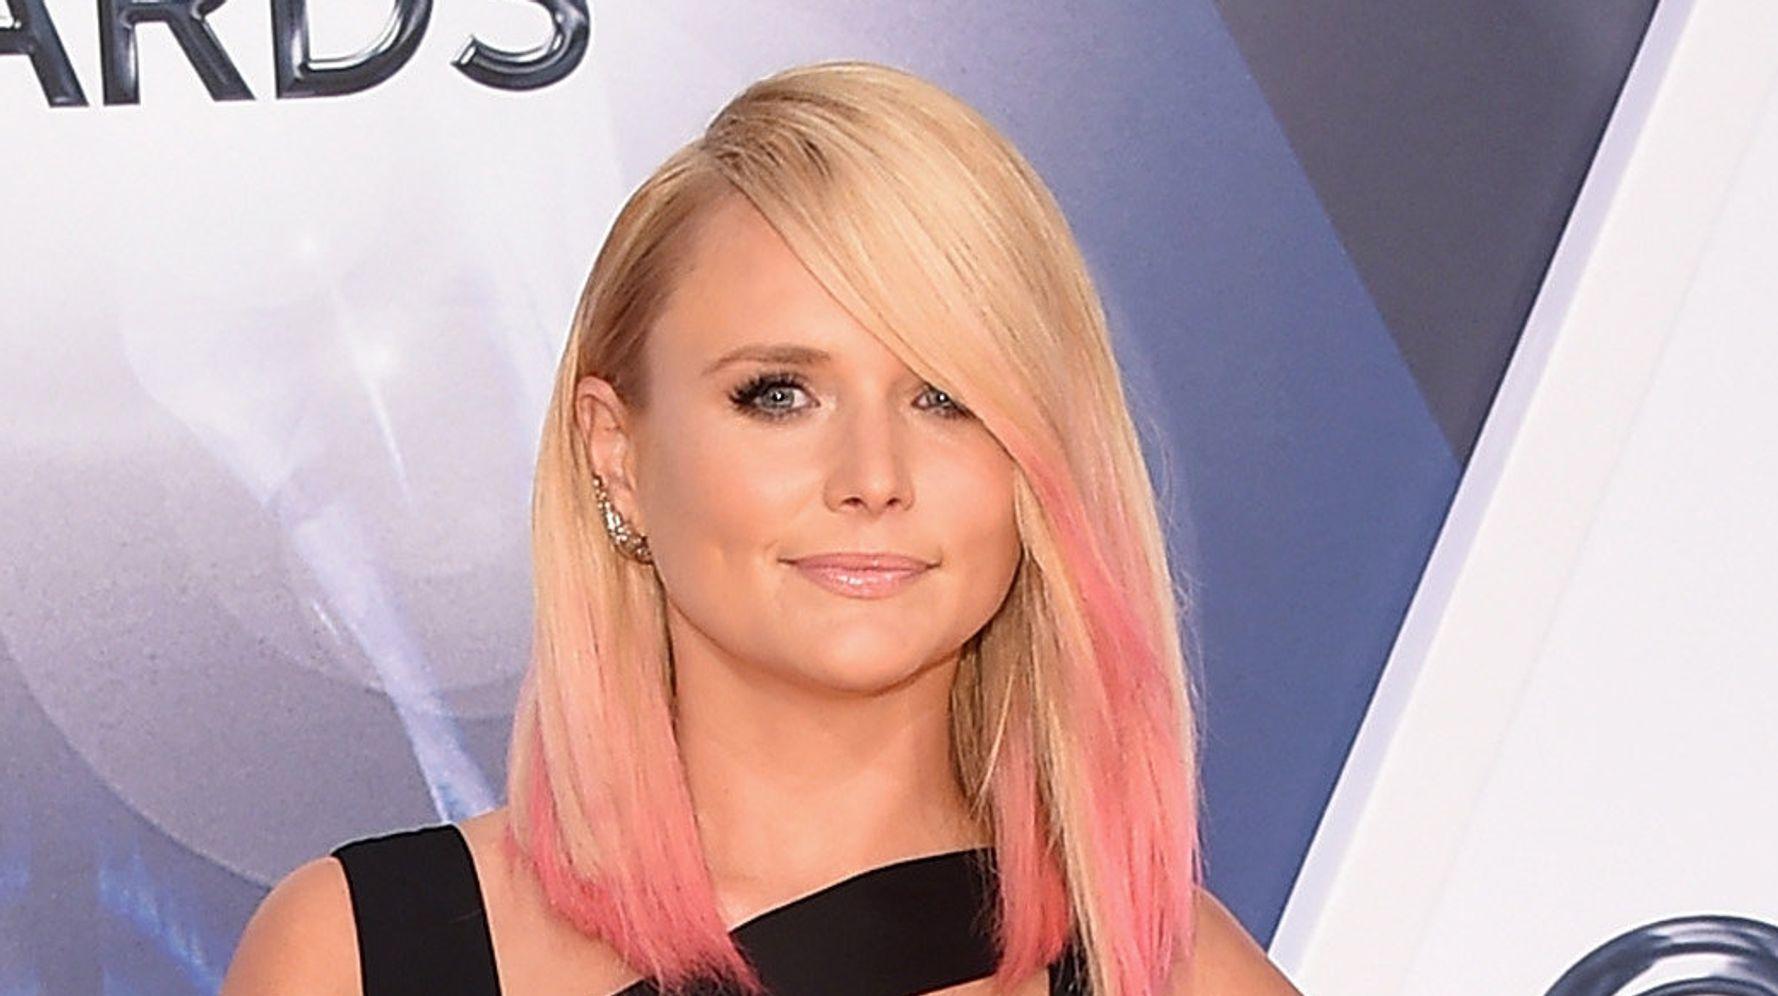 Miranda Lambert Is Ready To Mingle On This Week's Best-Dressed List